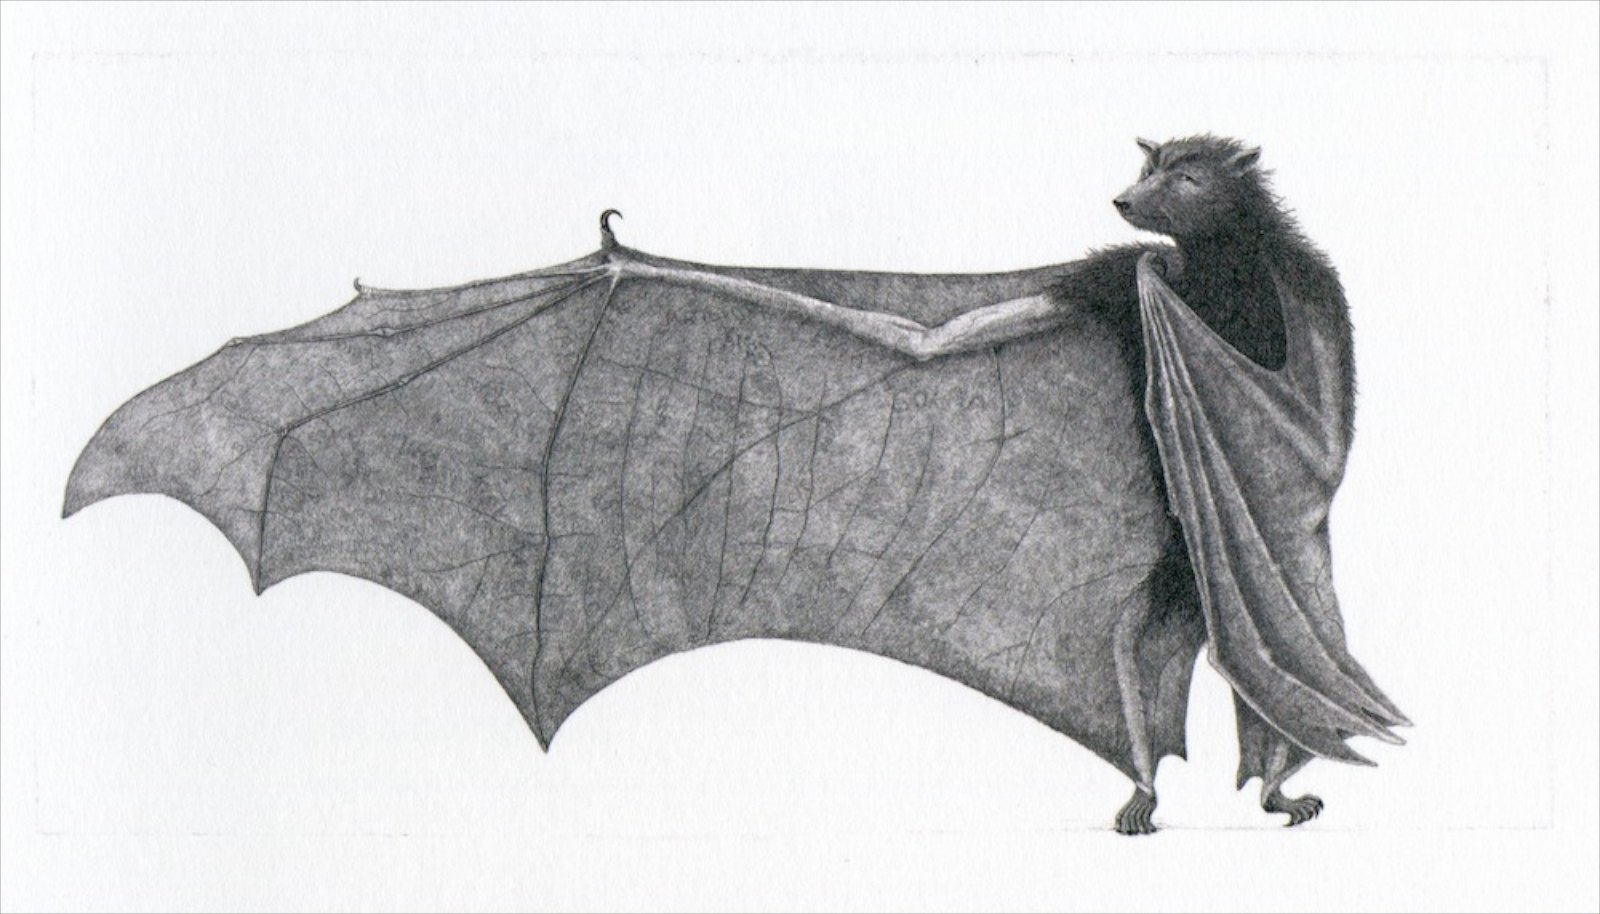 Ulla Fries, filosofen, 2000, fopperplate engraving, 25 x 49 cm, Ed. 90